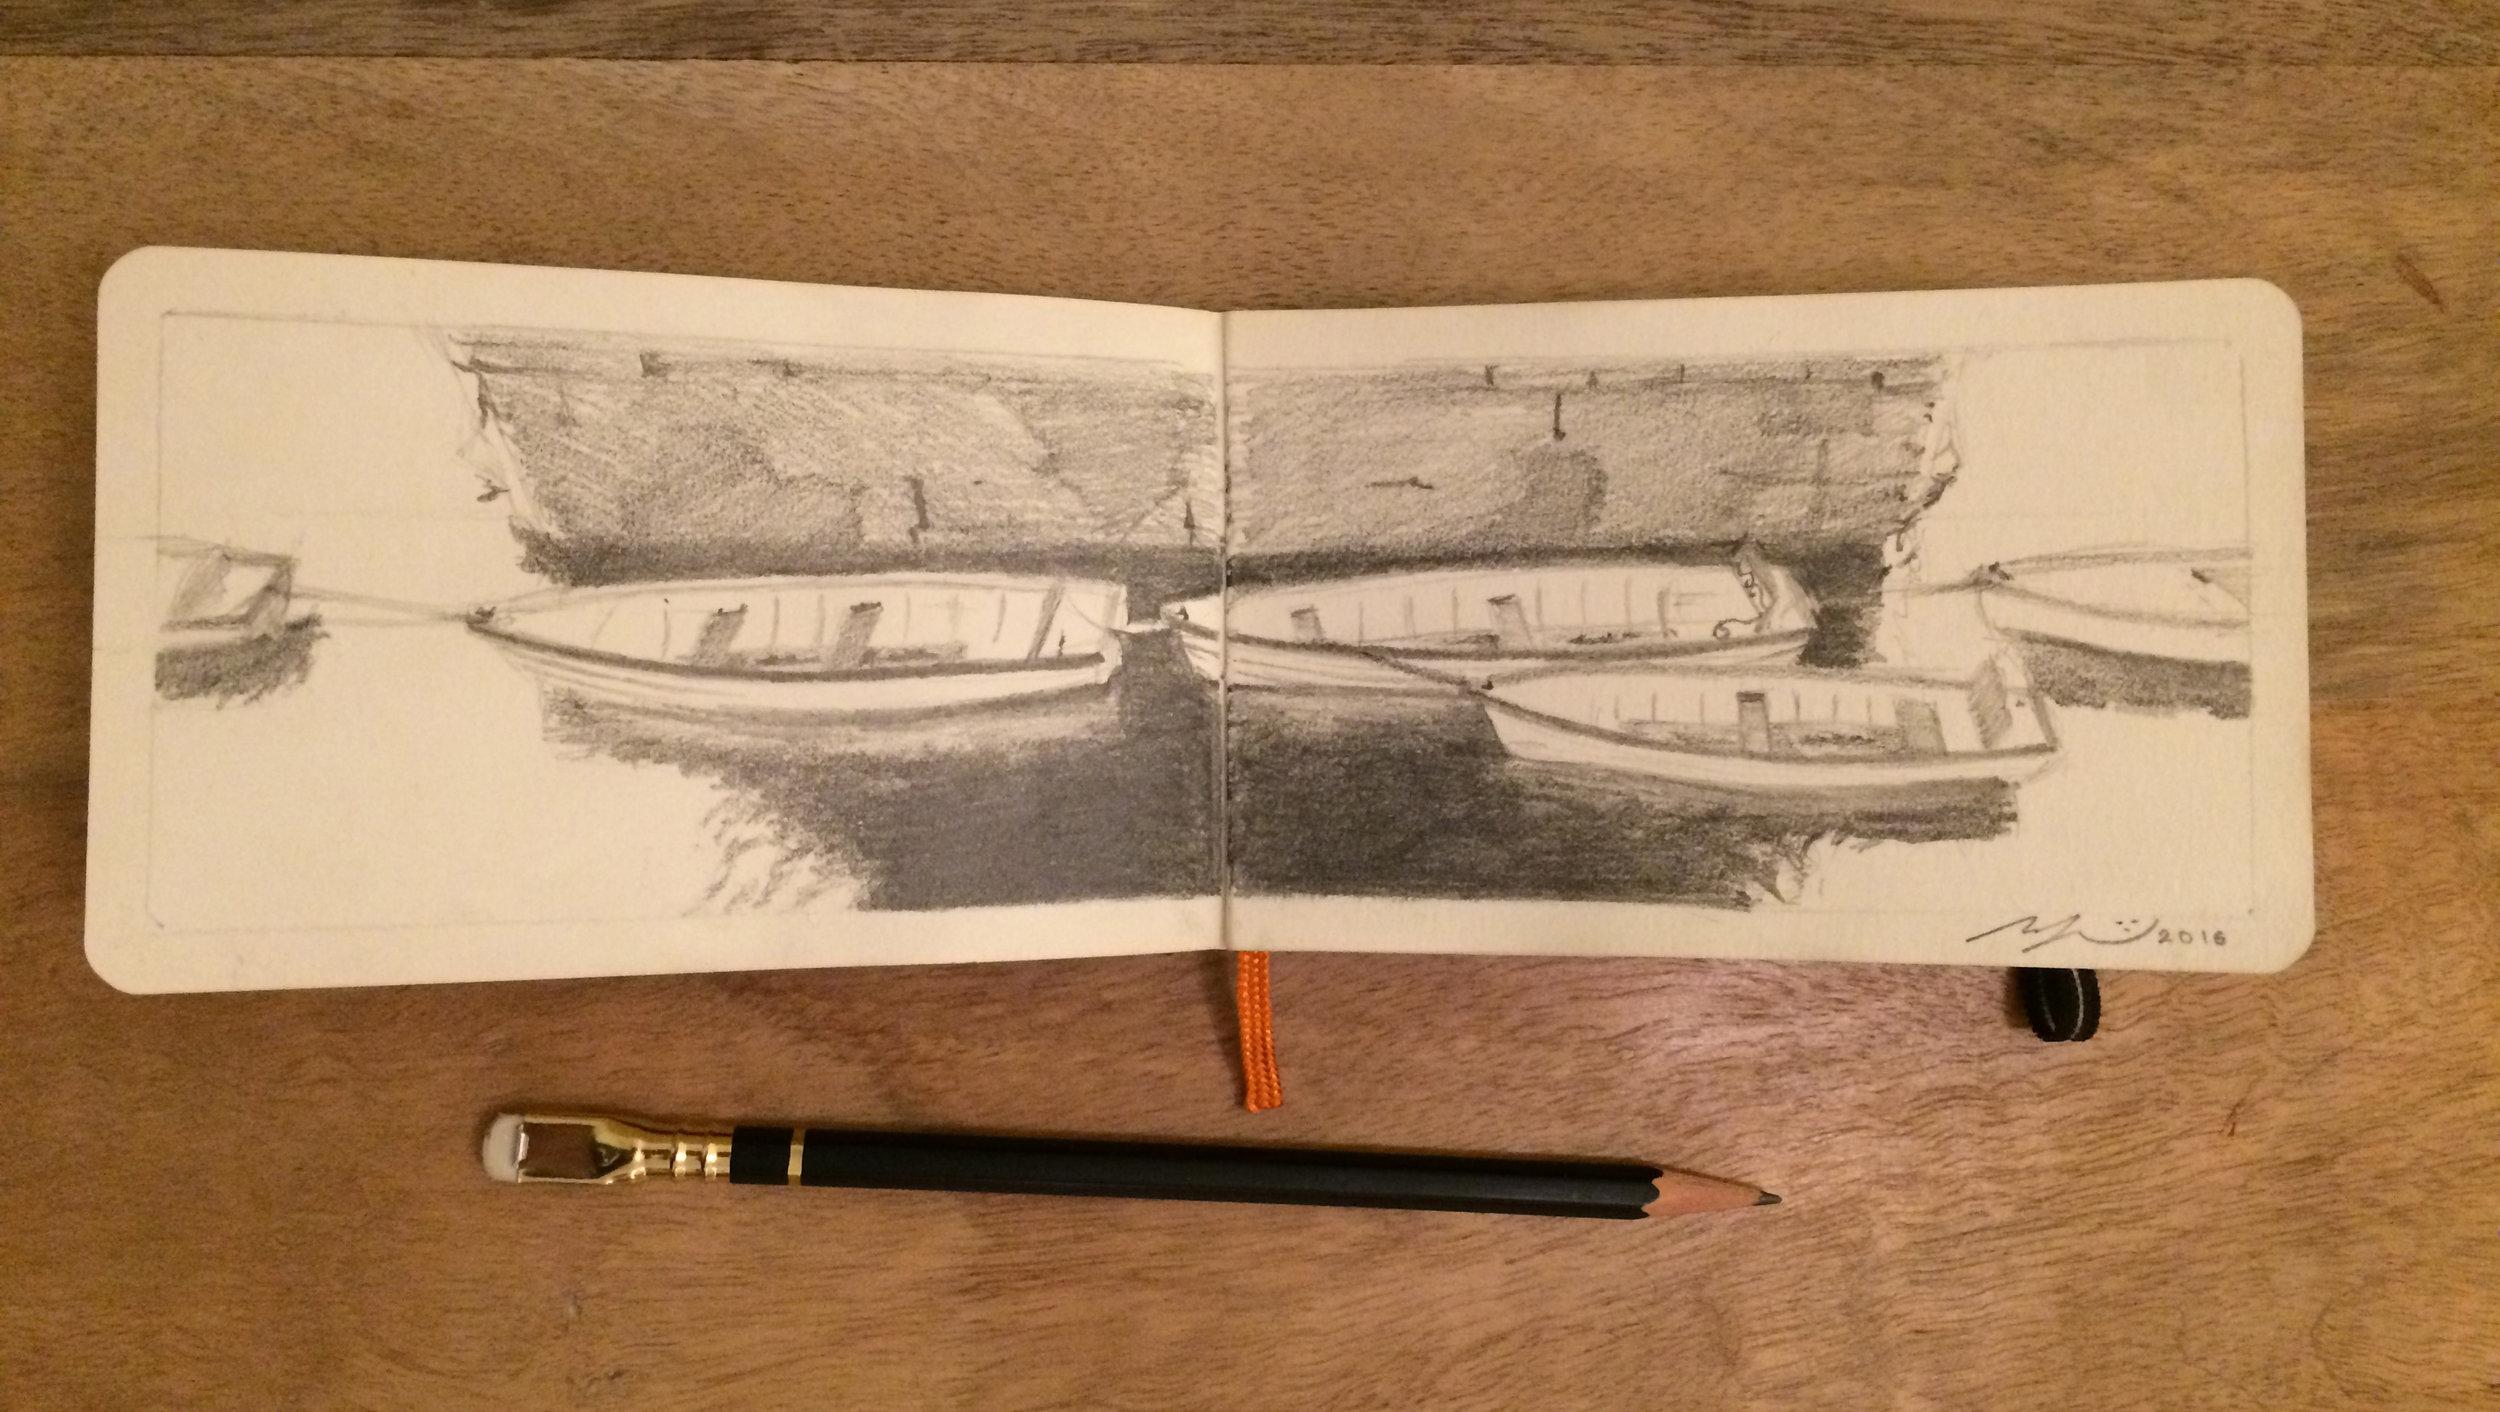 RAFAEL MARTIN C Sketchbook_007.jpg